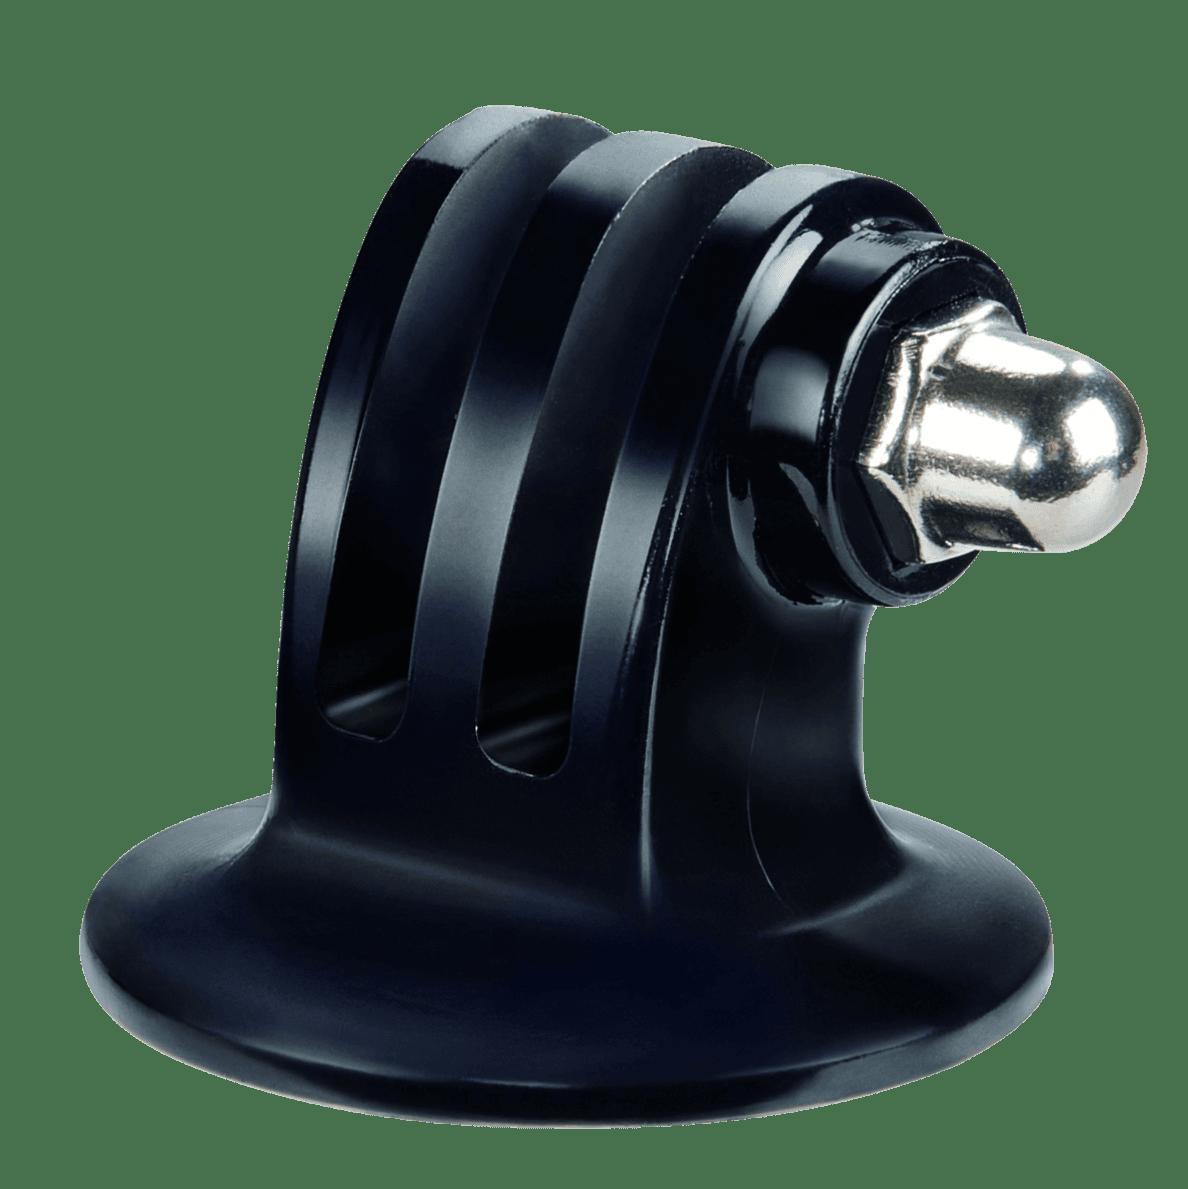 ISY IAA-1100 Kameraadapter für GoPro Actioncams